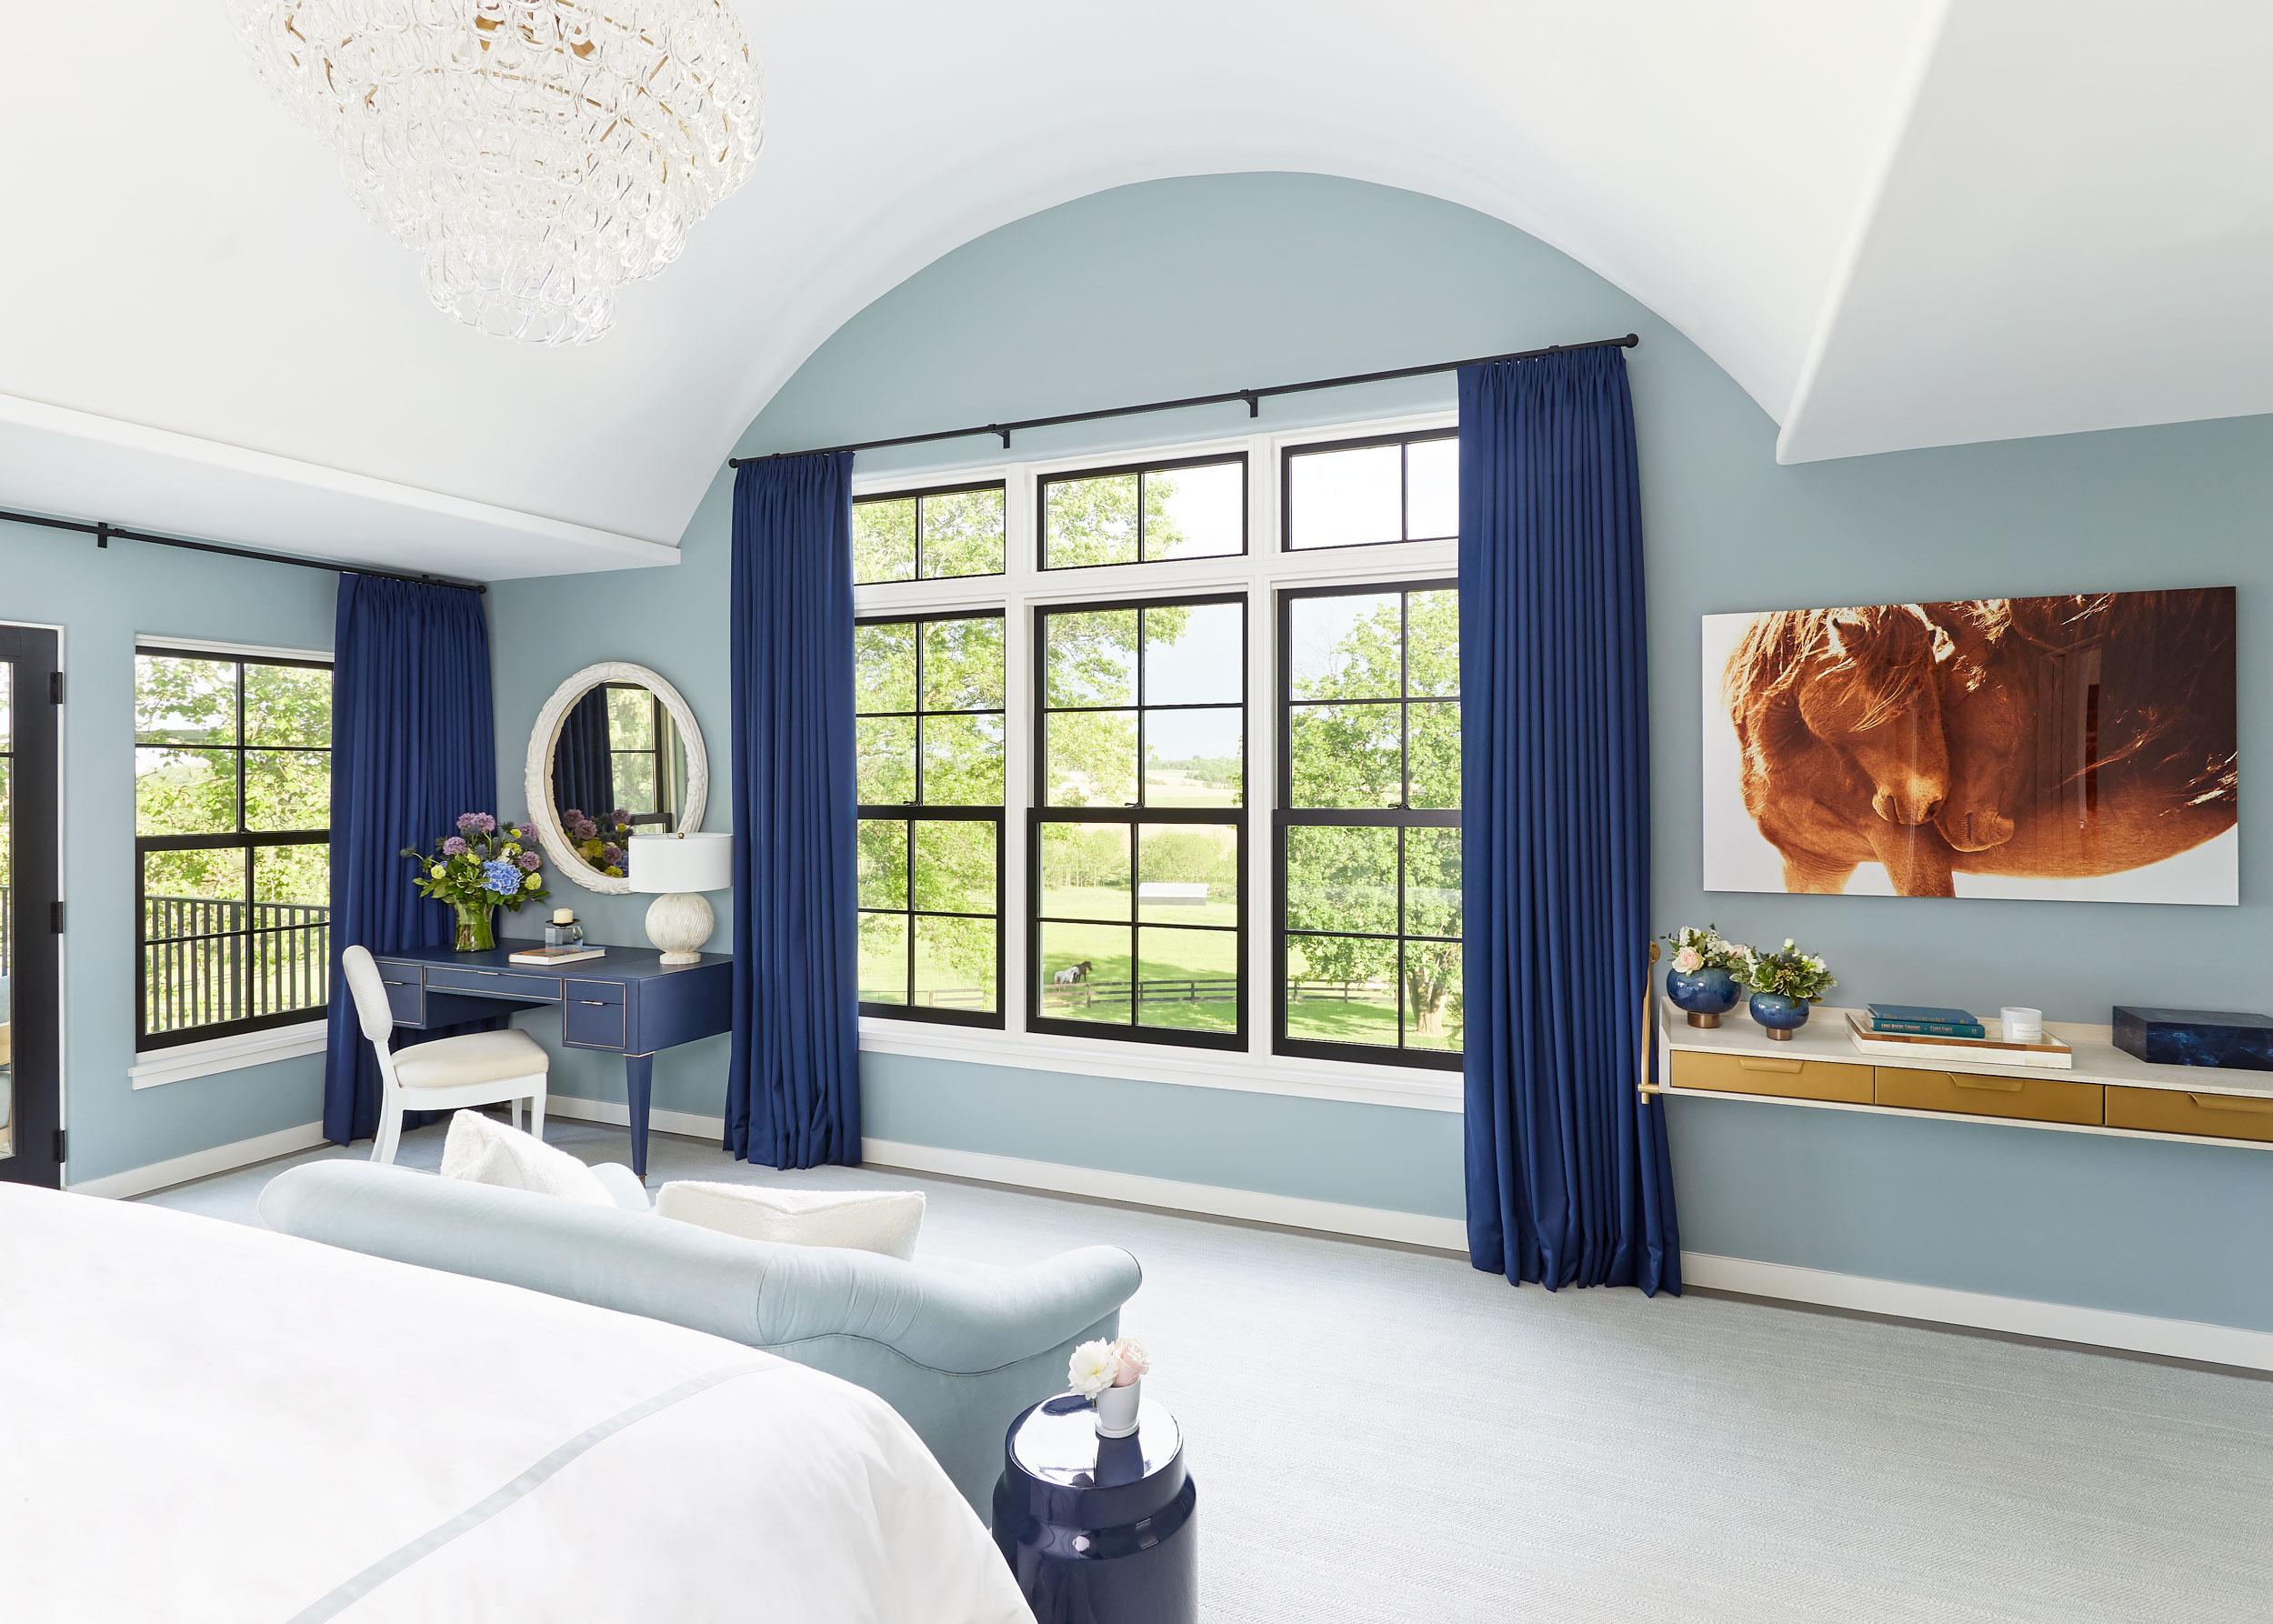 ABH---DM---Master-Bedroom-3.jpg